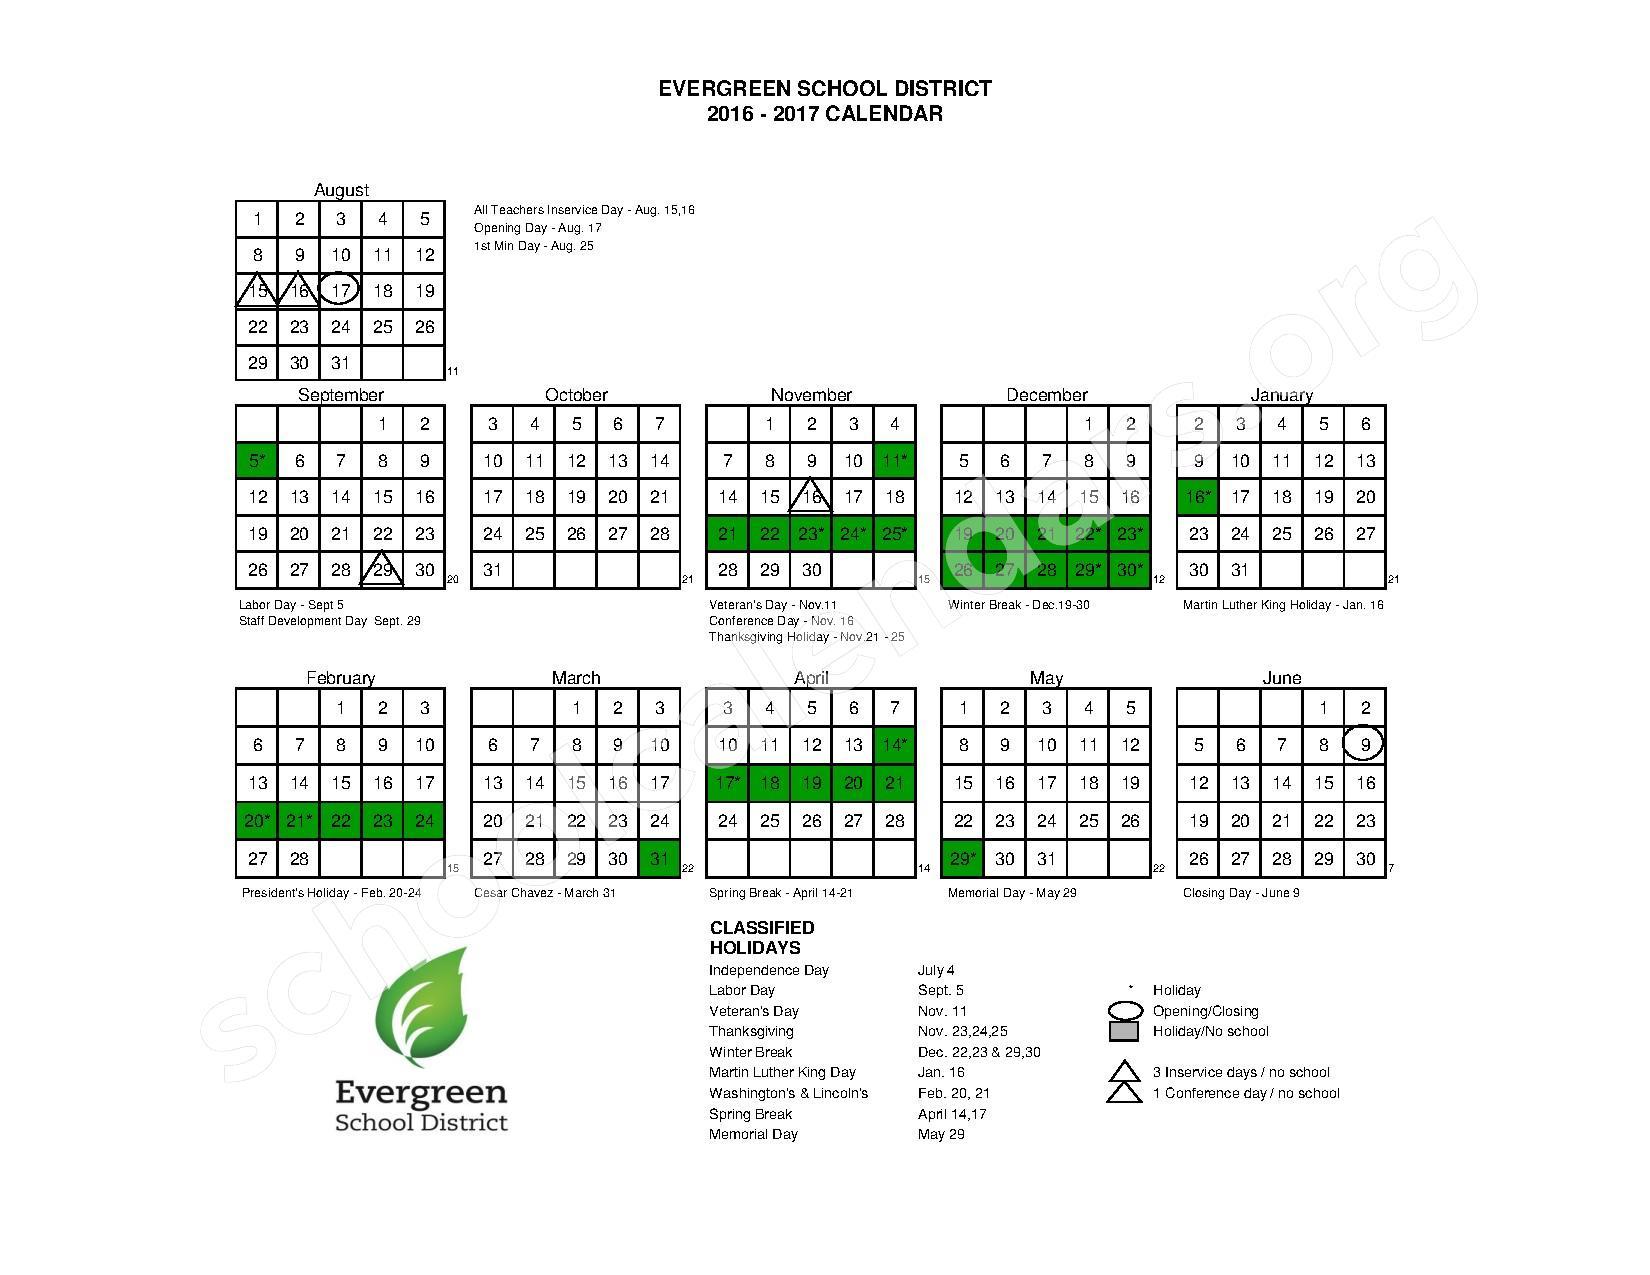 2016 - 2017 School Calendar – Evergreen School District – page 1